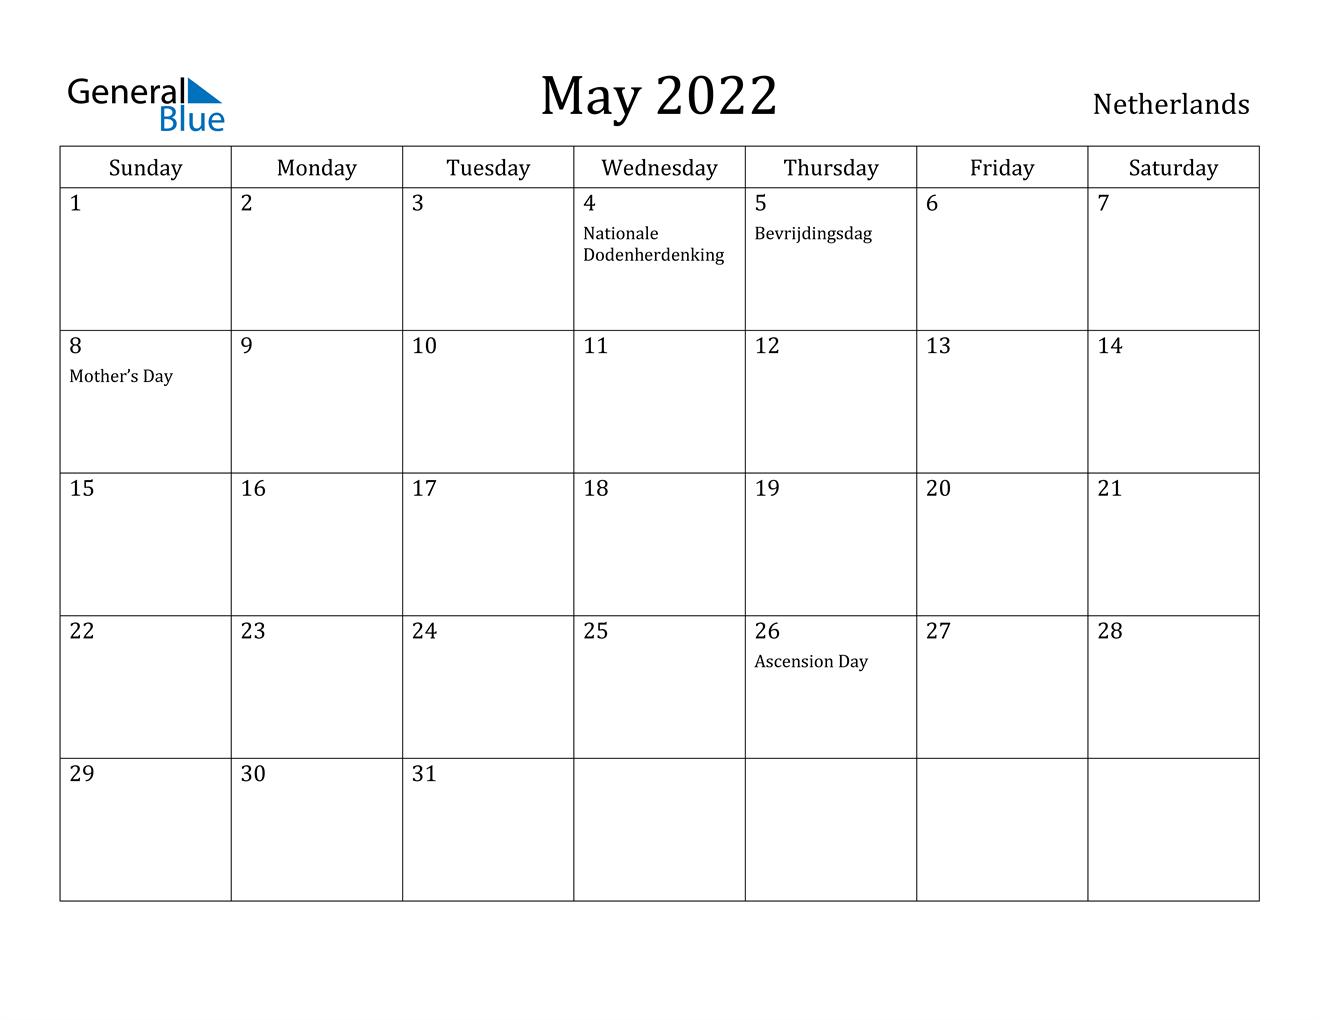 May 2022 Calendar - Netherlands